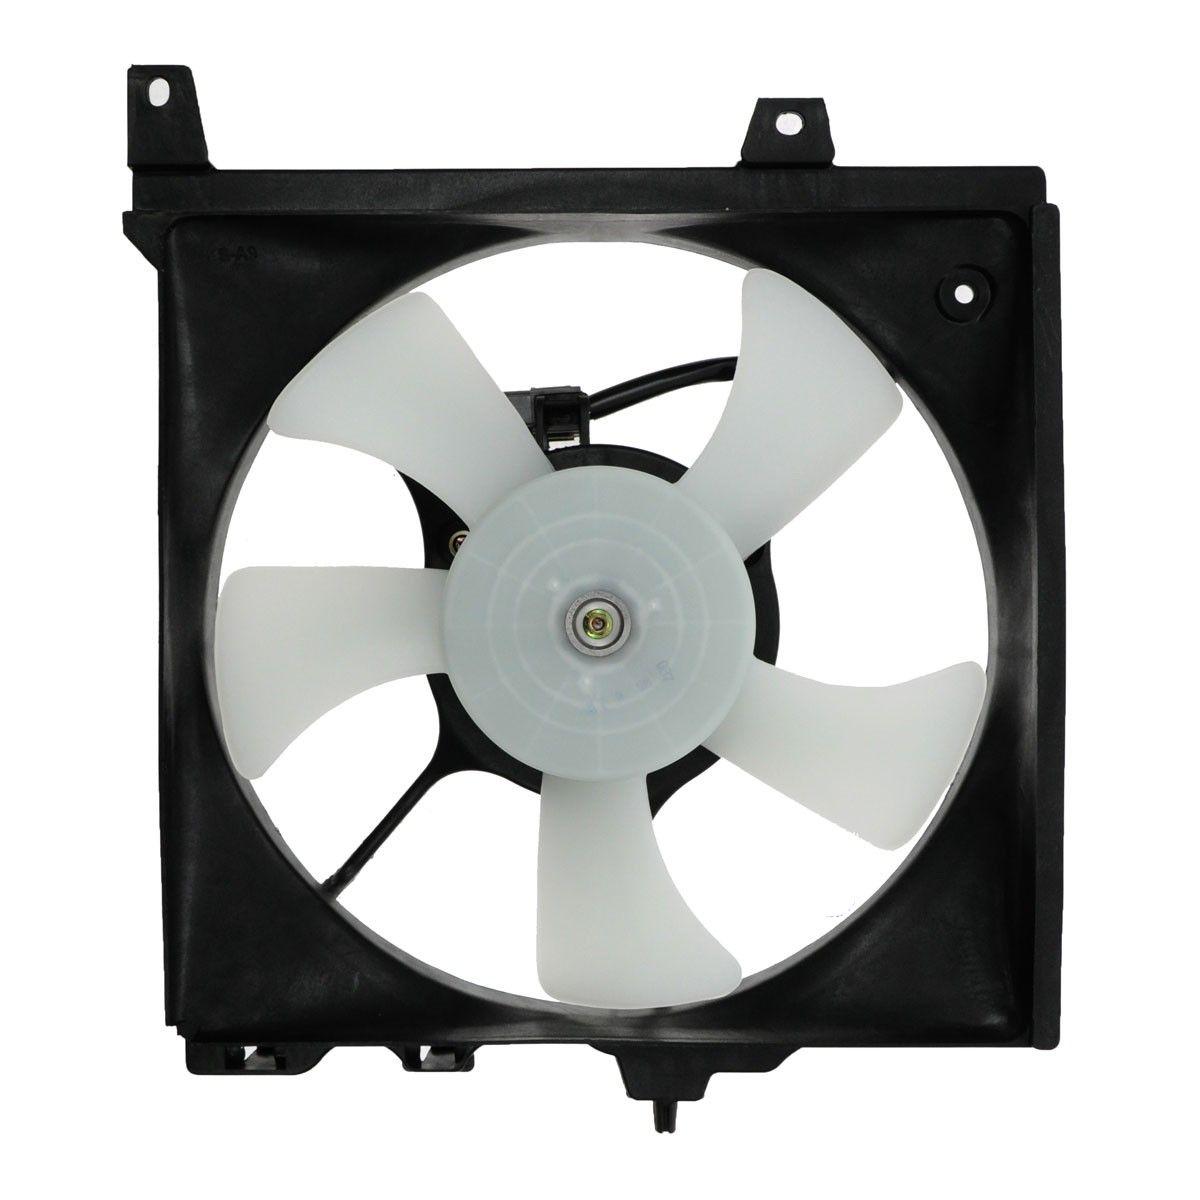 Nissan Sentra Service Manual: Cooling fan control